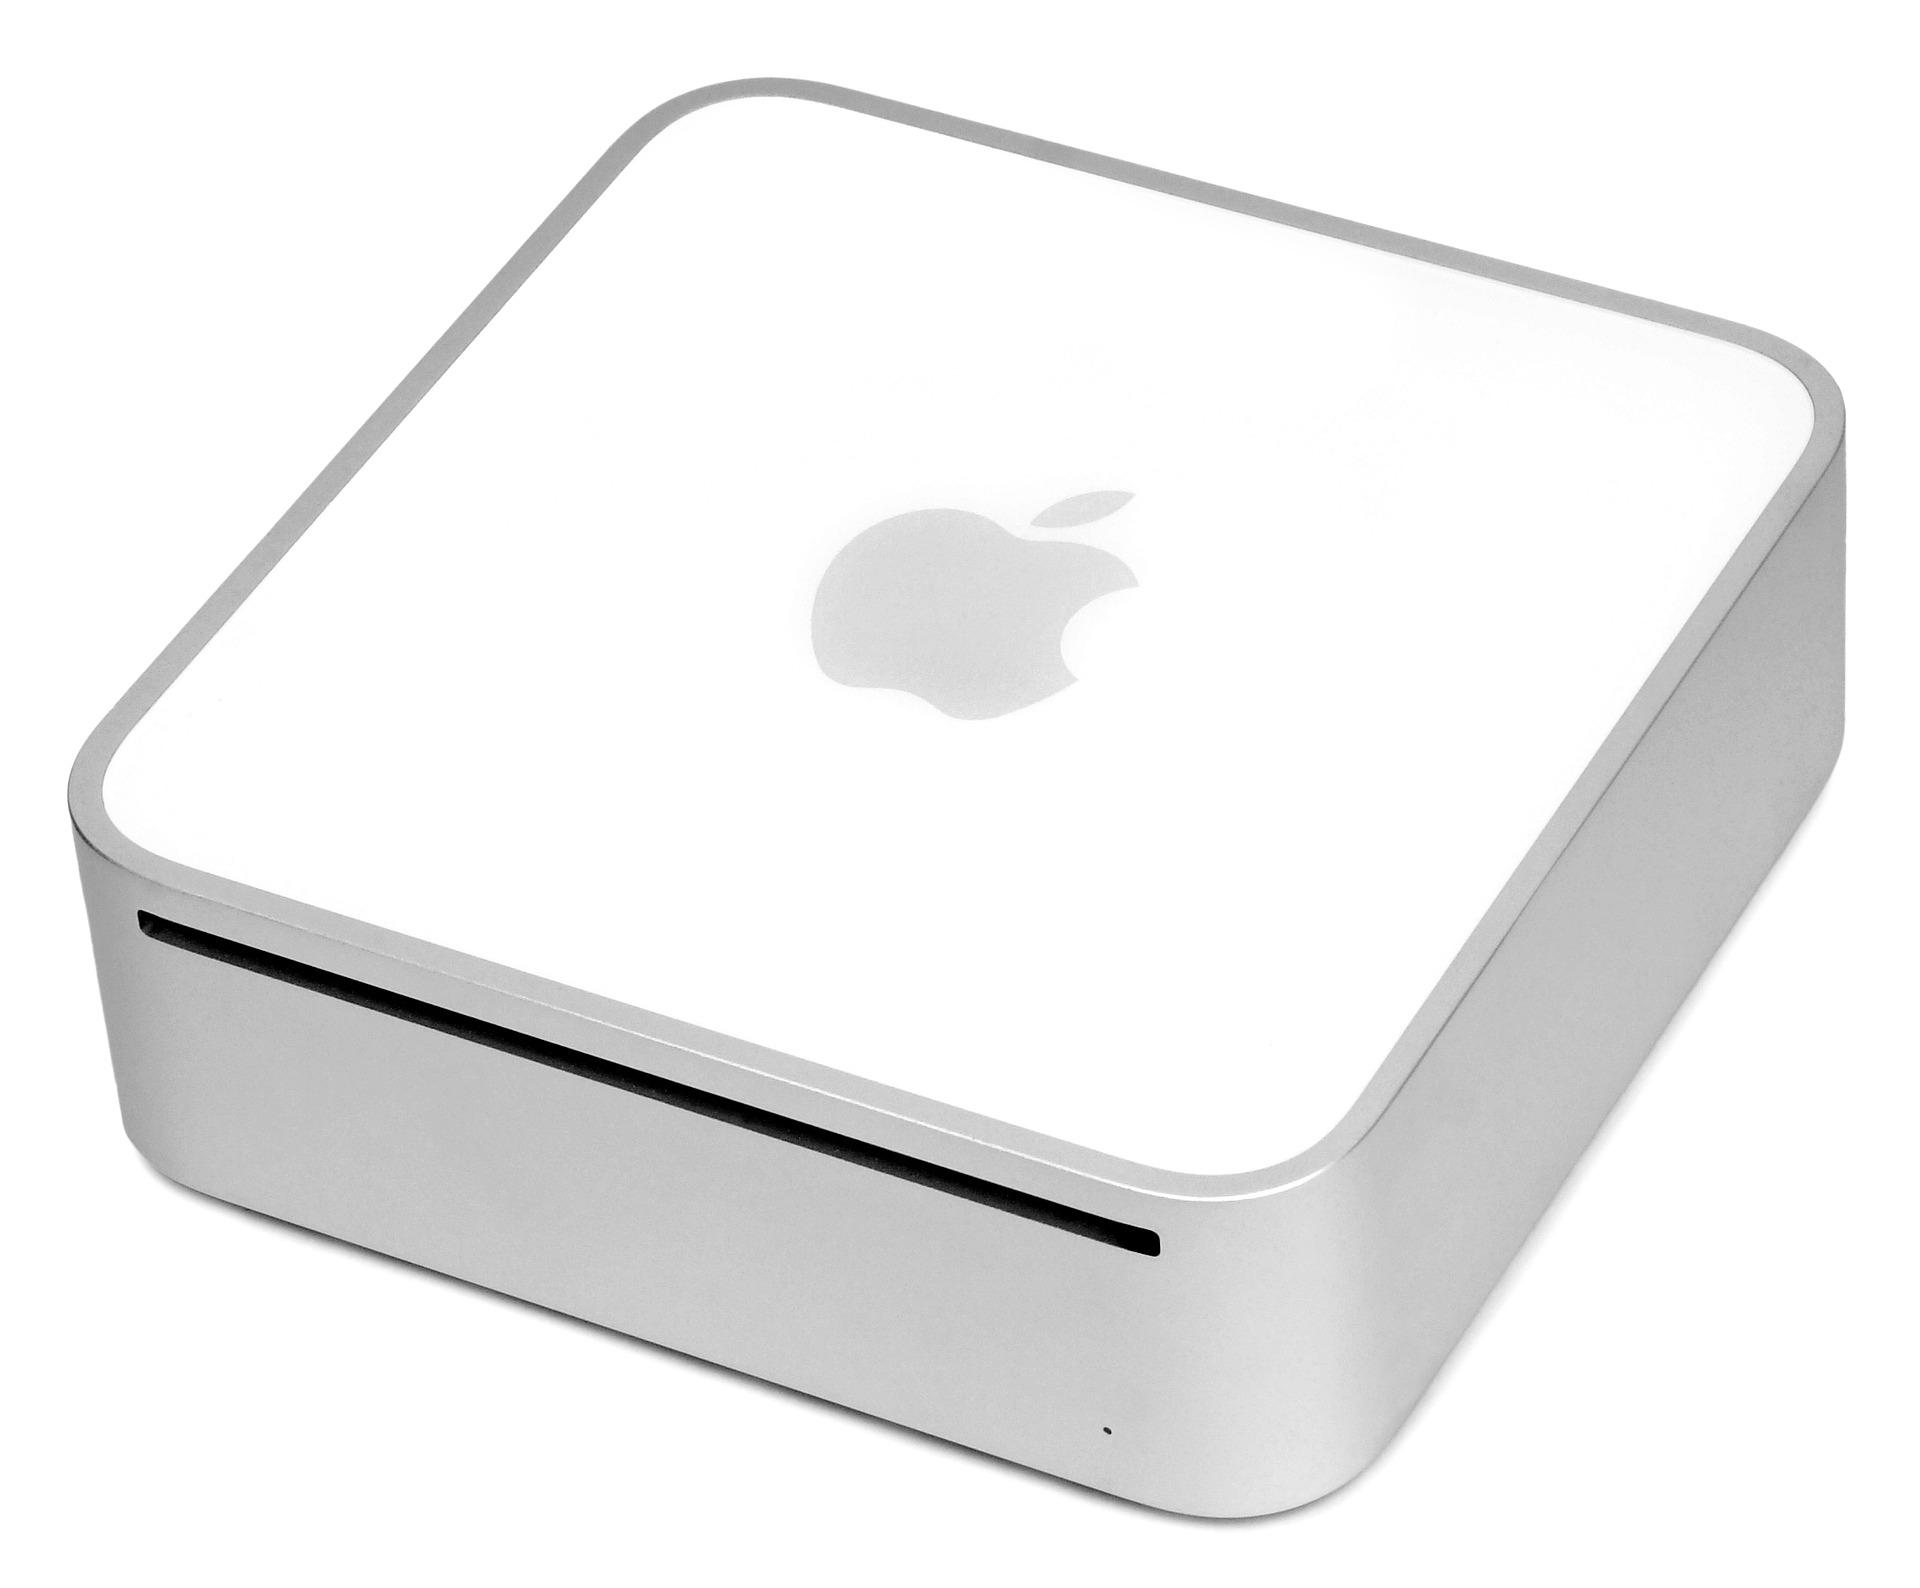 Mac Mini Reinigung